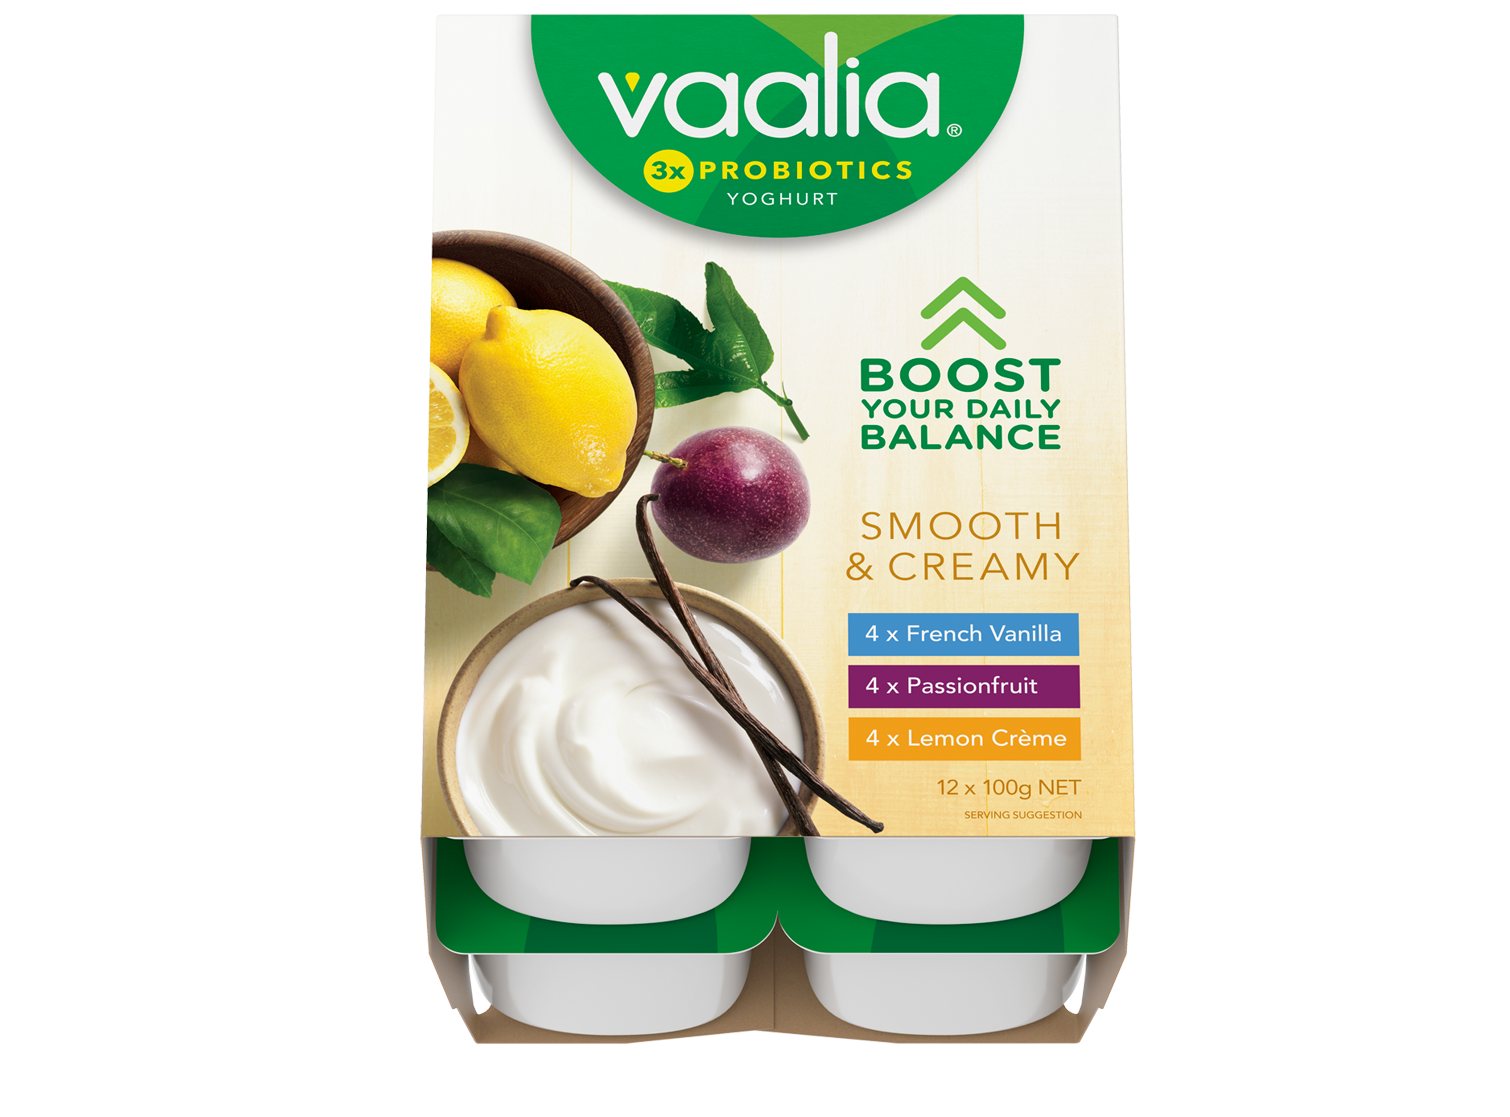 Vaalia Smooth Creamy 12 pack - featured image